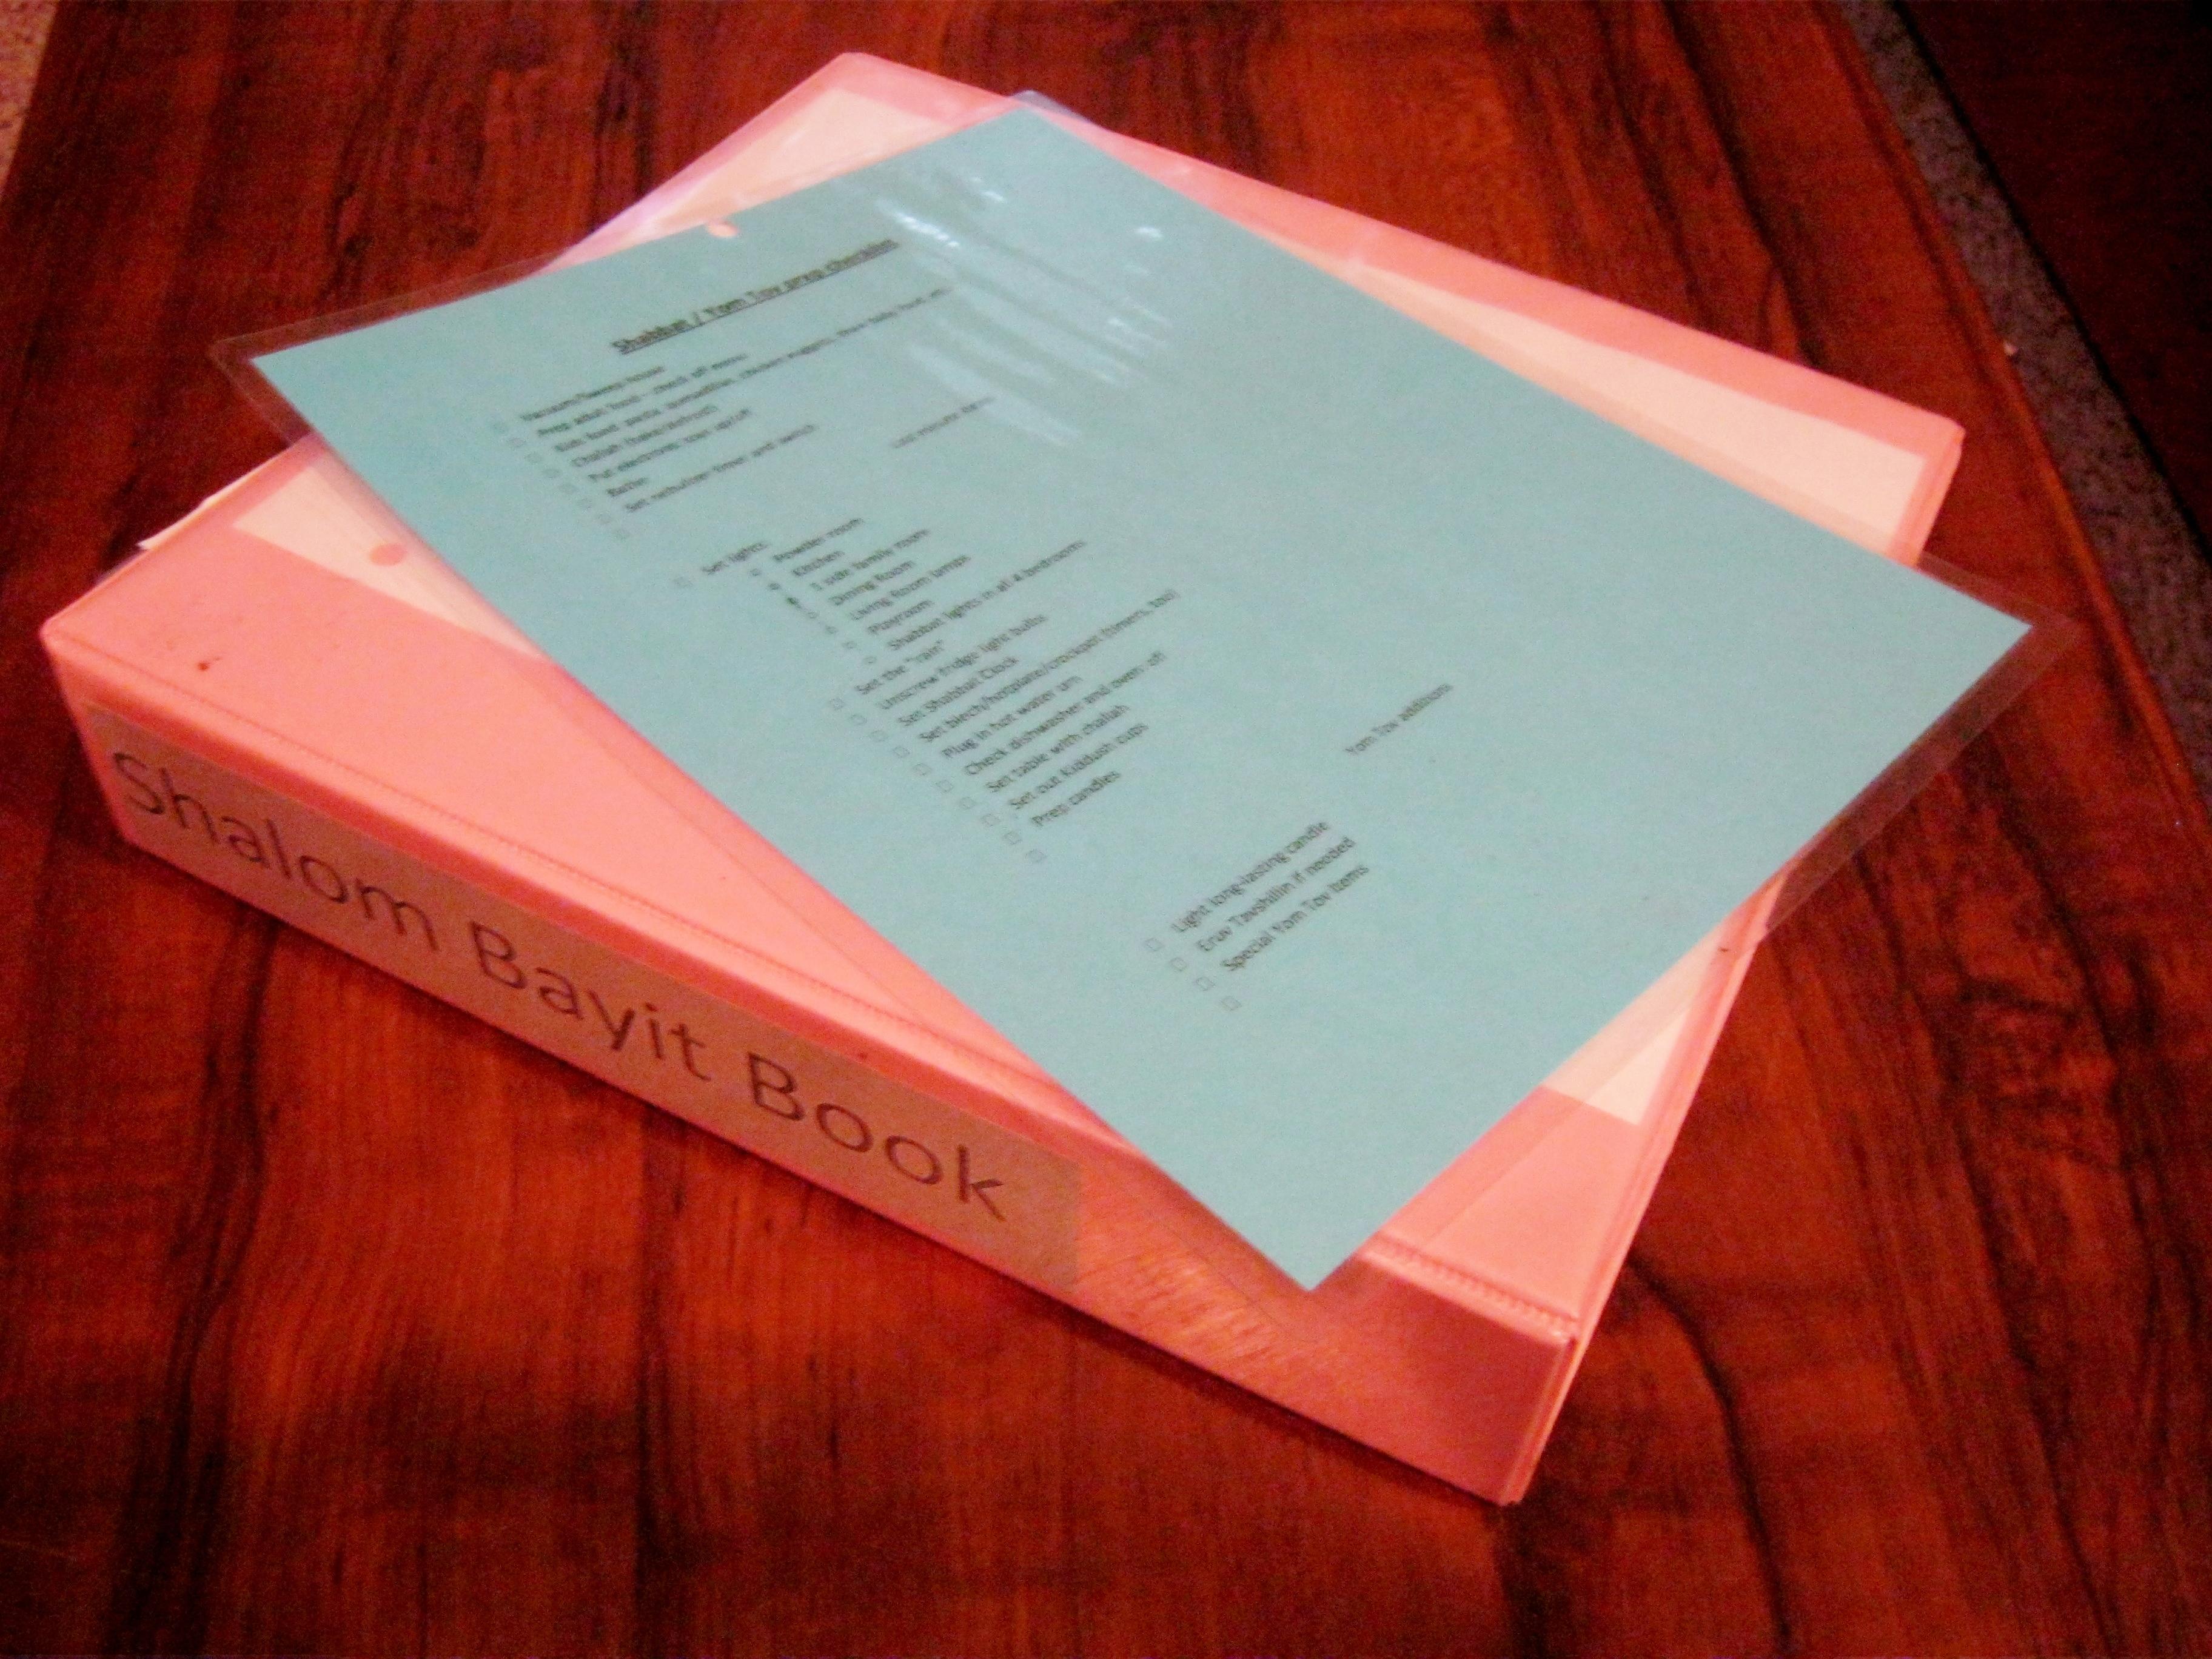 Shalom Bayit book (SBB)